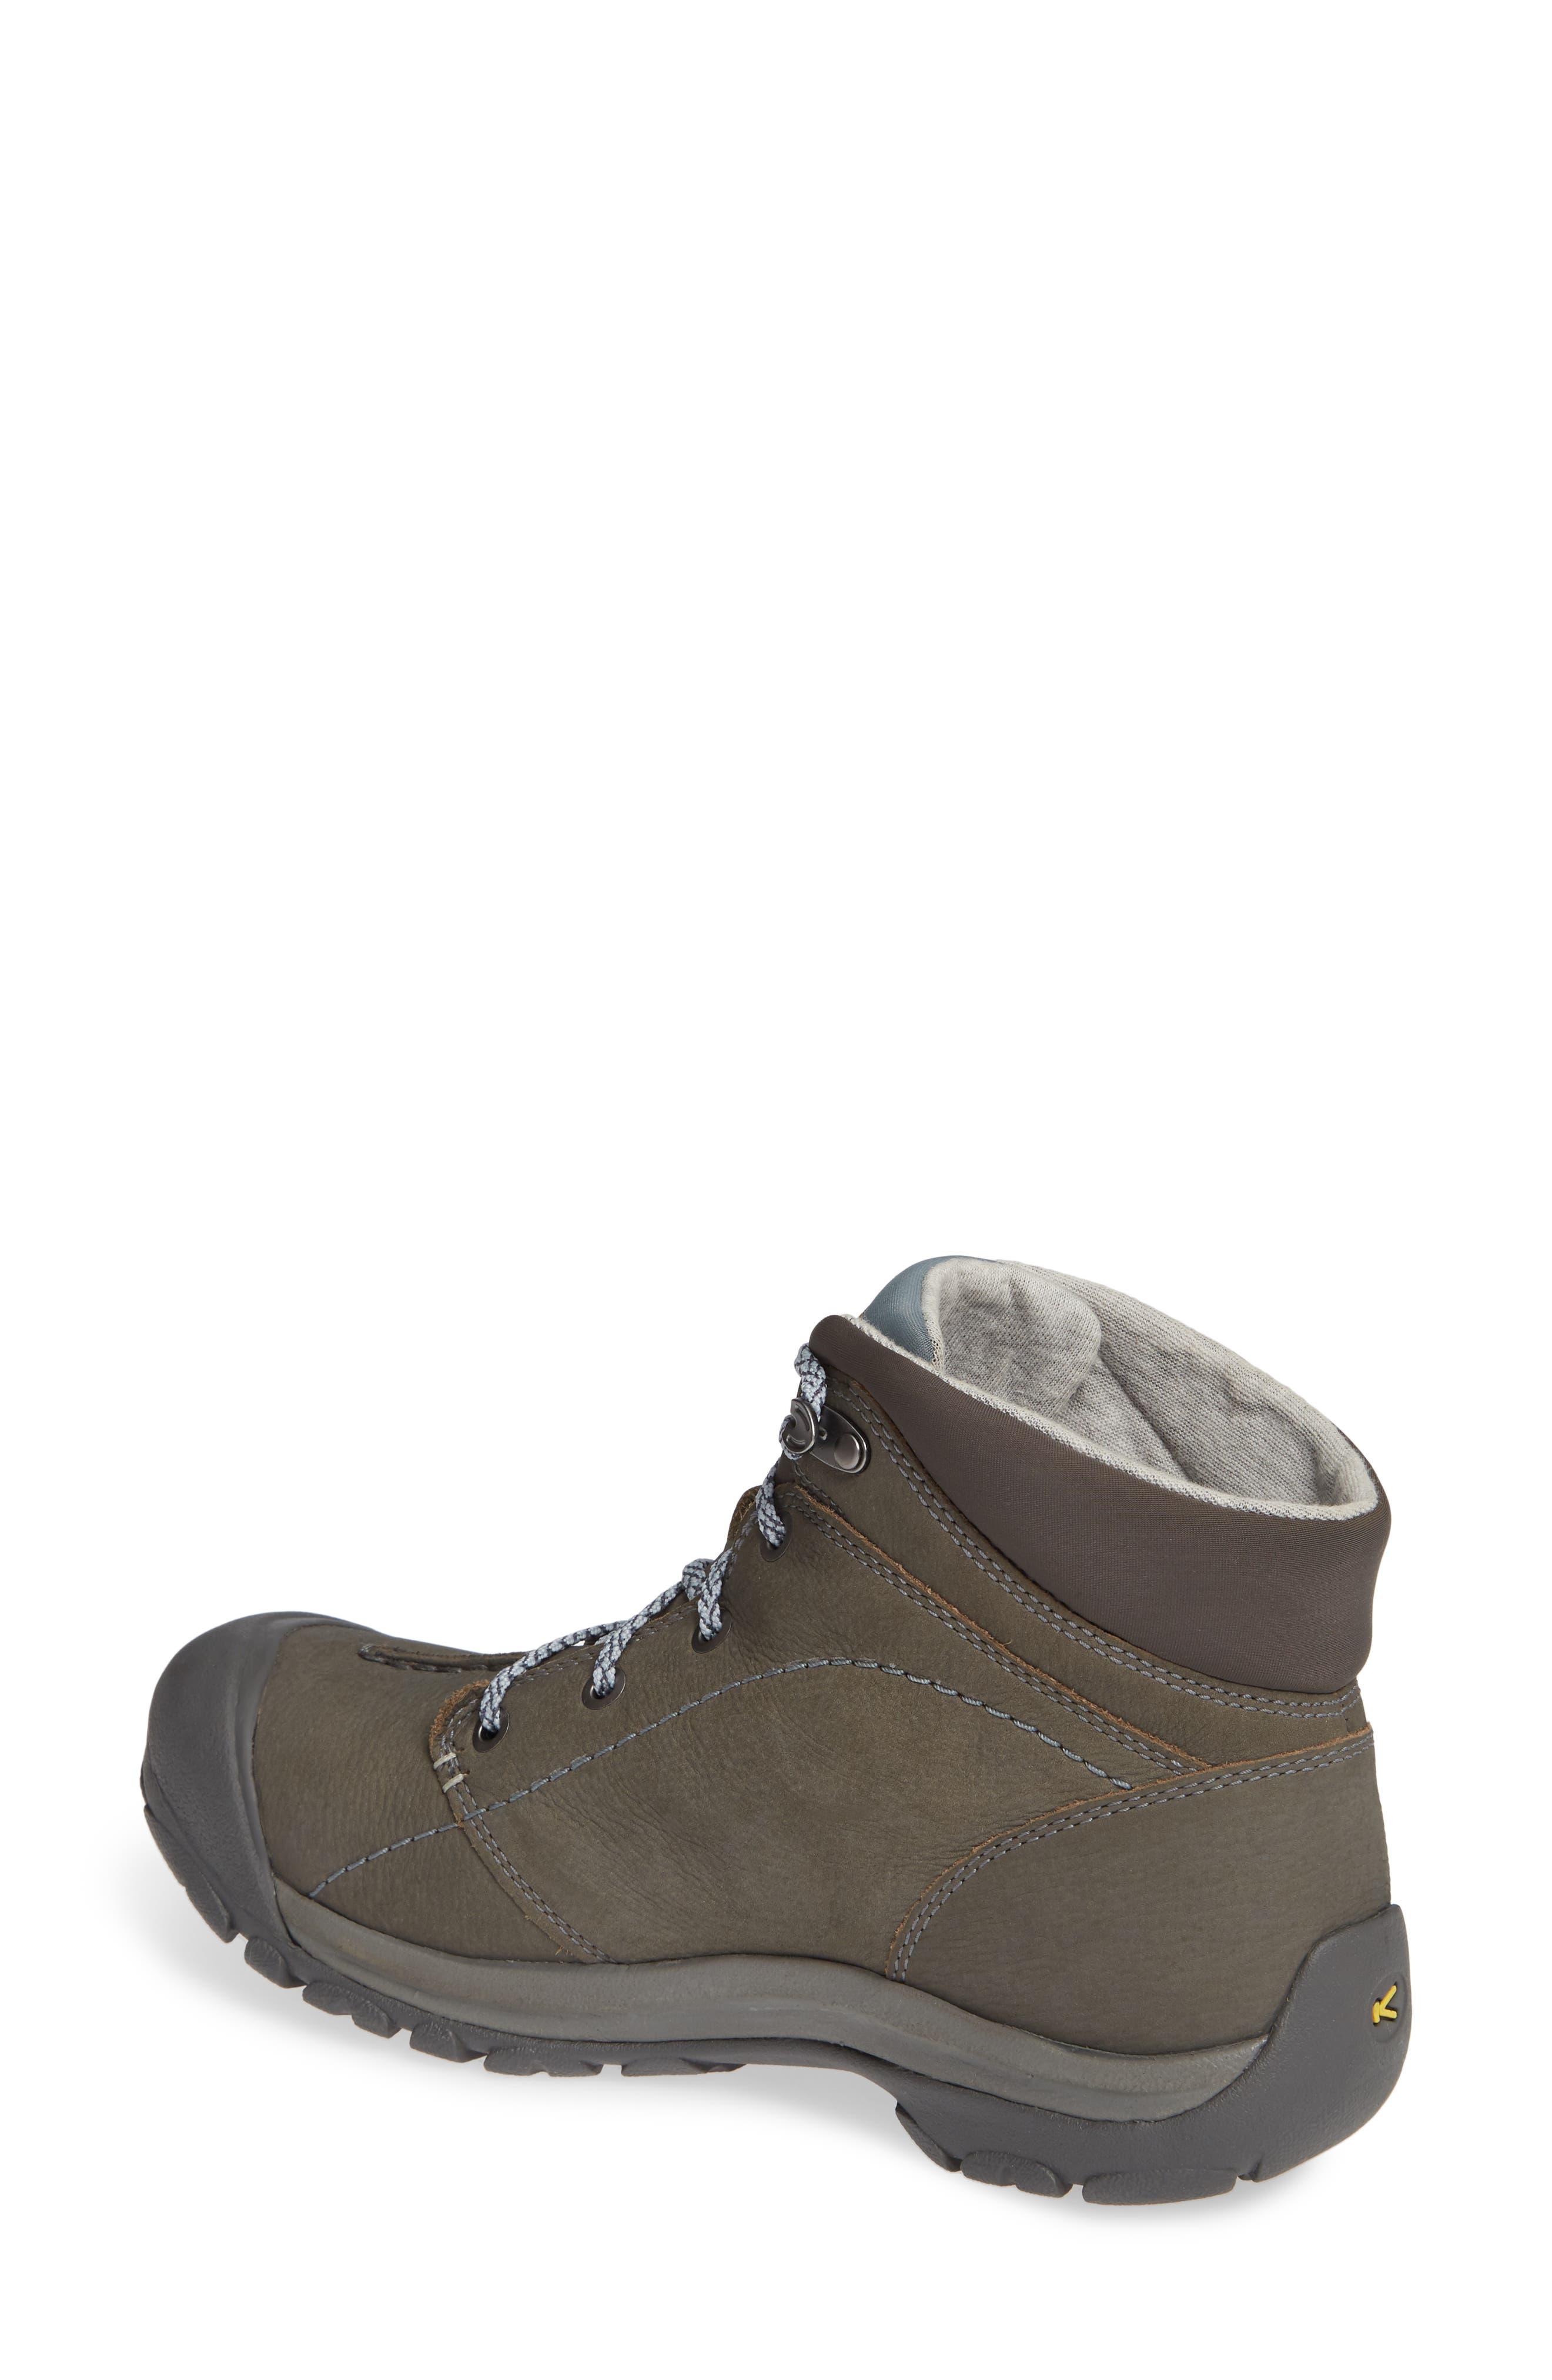 Kaci Waterproof Winter Boot,                             Alternate thumbnail 2, color,                             TURBULENCE/ STORMY WEATHER